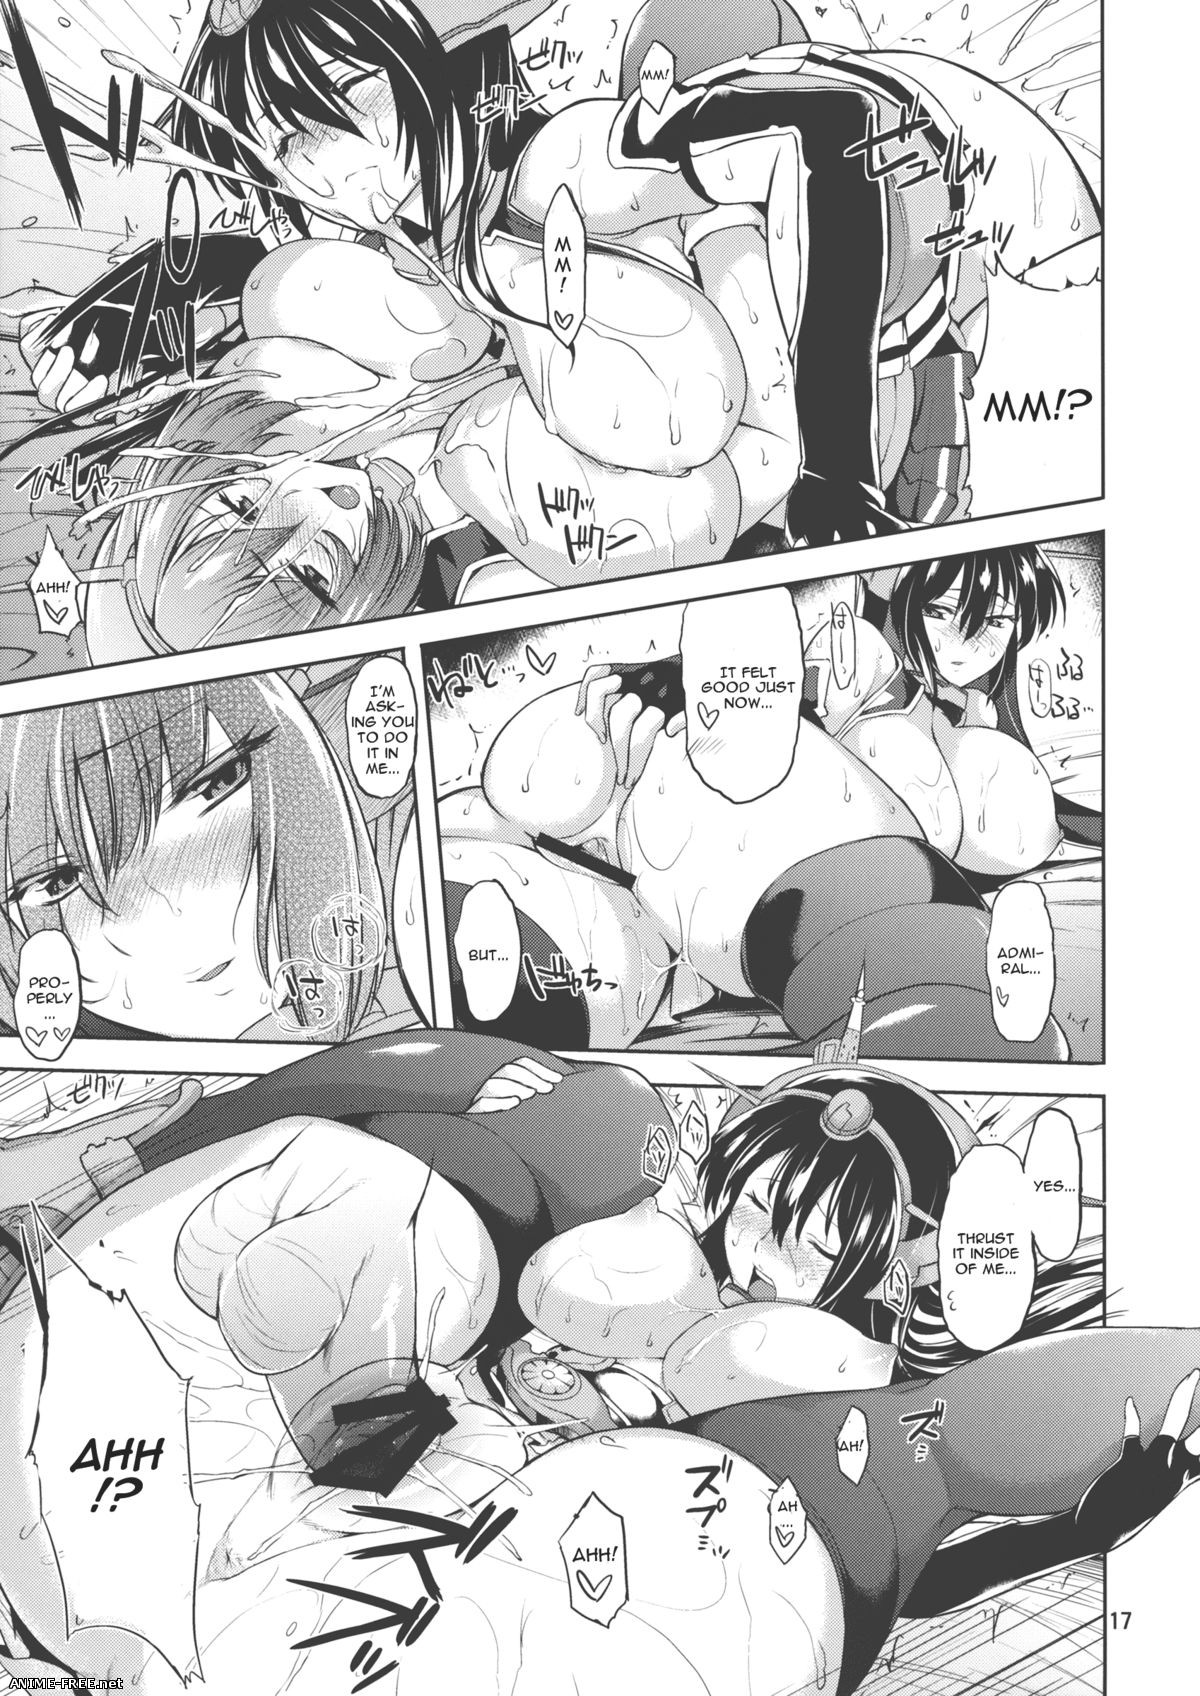 Kantai Collection Doujins Collection - сборник хентай манги [Cen] [ENG,JAP,CHI] Manga Hentai